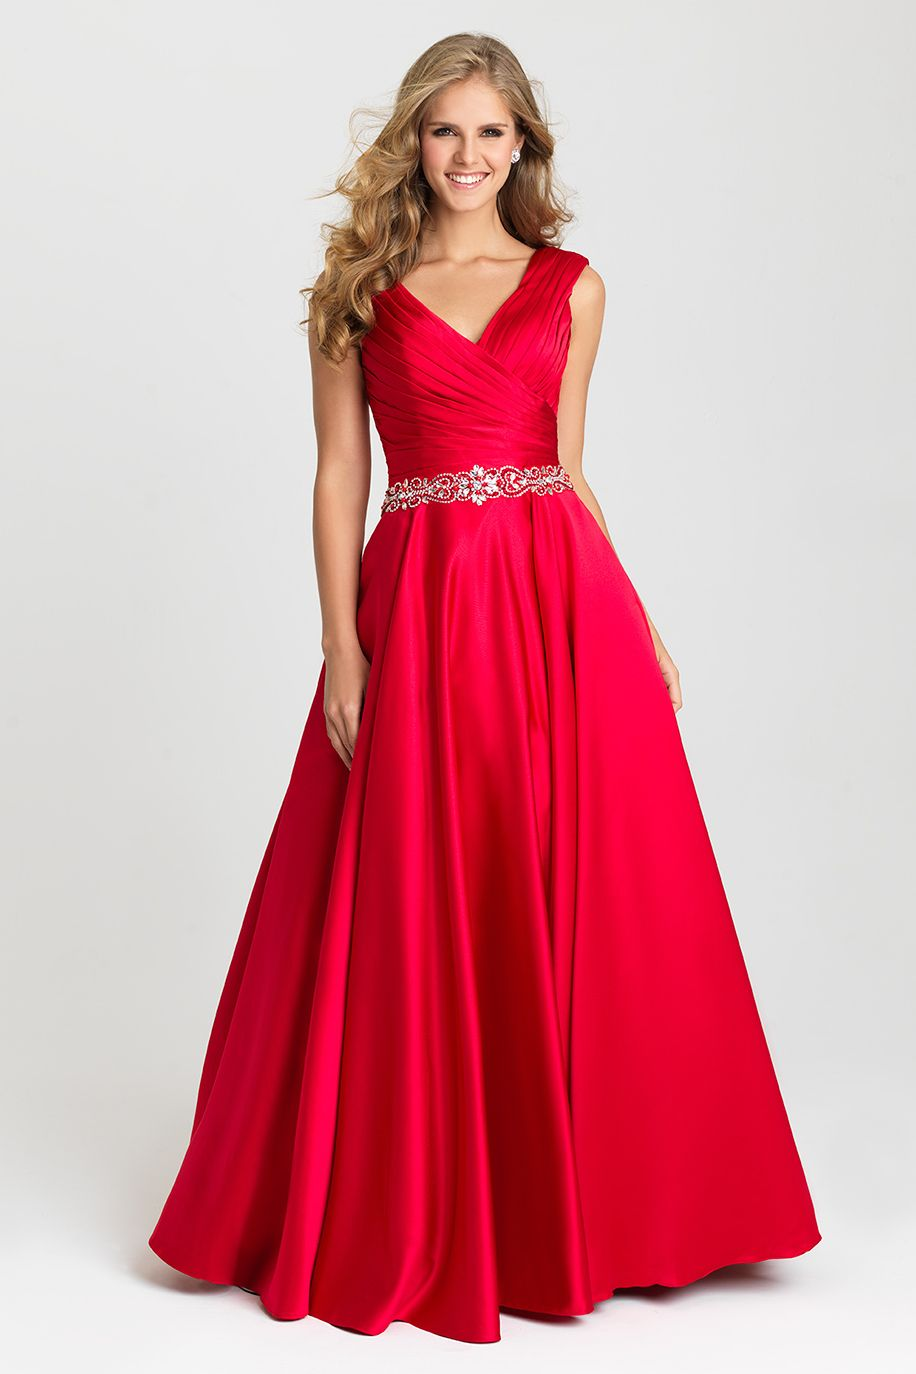 2017 Prom Dress Style 16 419 Gateway Bridal Prom Salt Lake